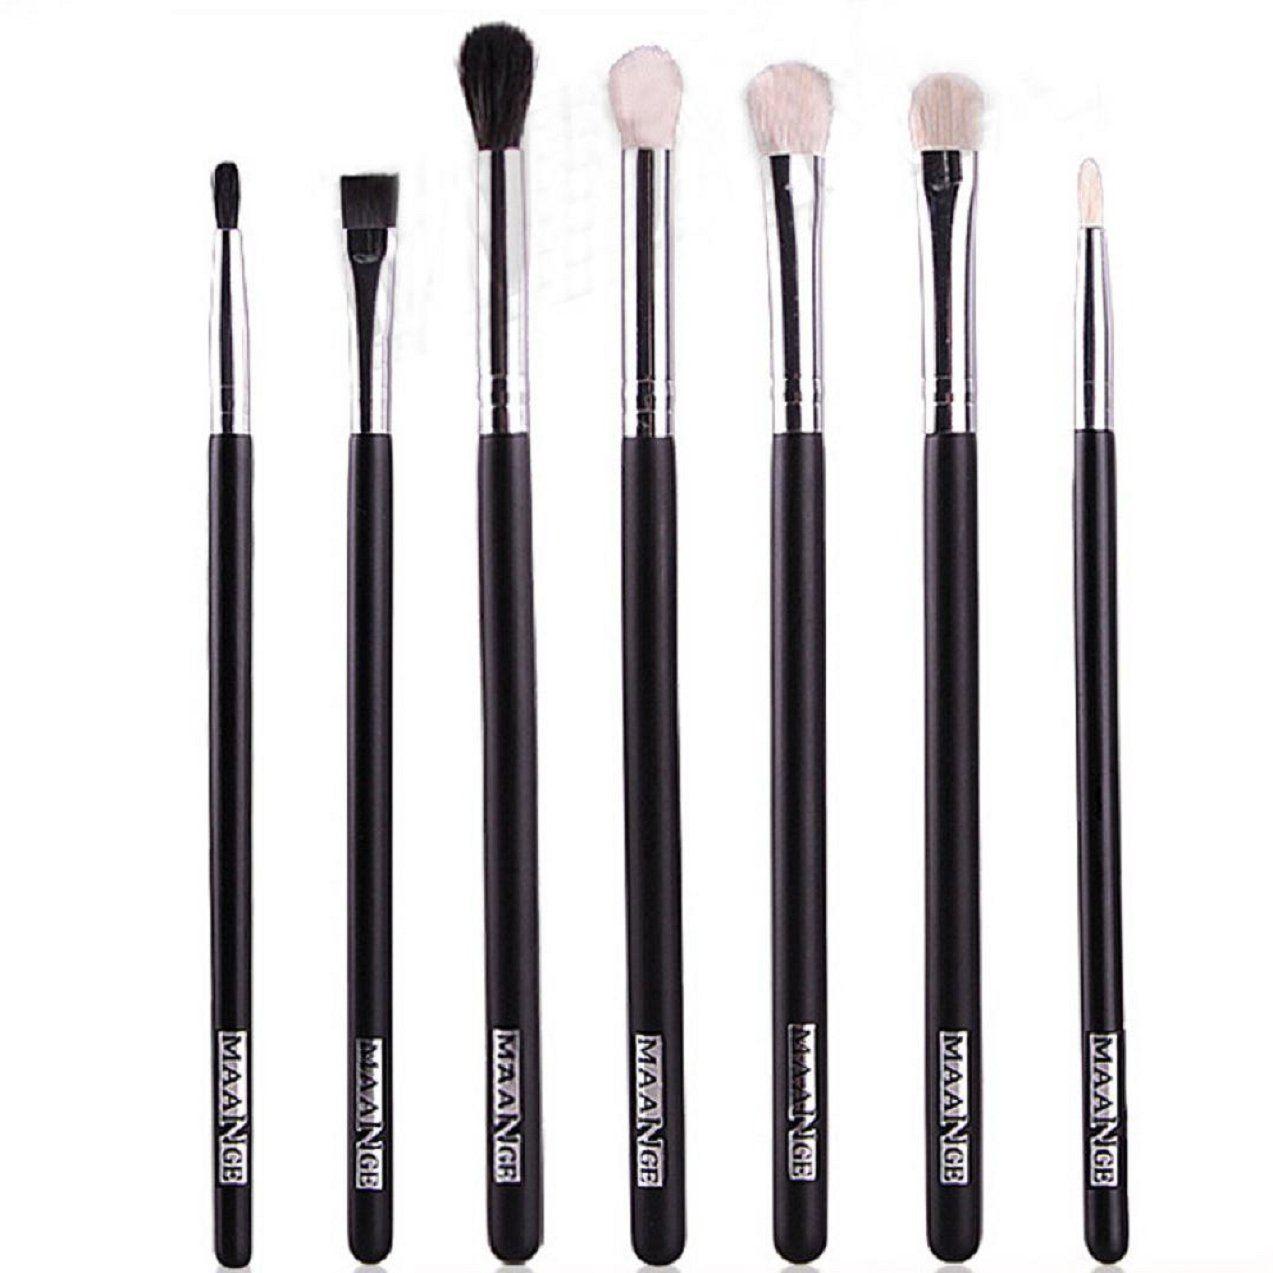 Tonsee 7PCS Makeup brushes Blend Shadow Eyeliner Smoked